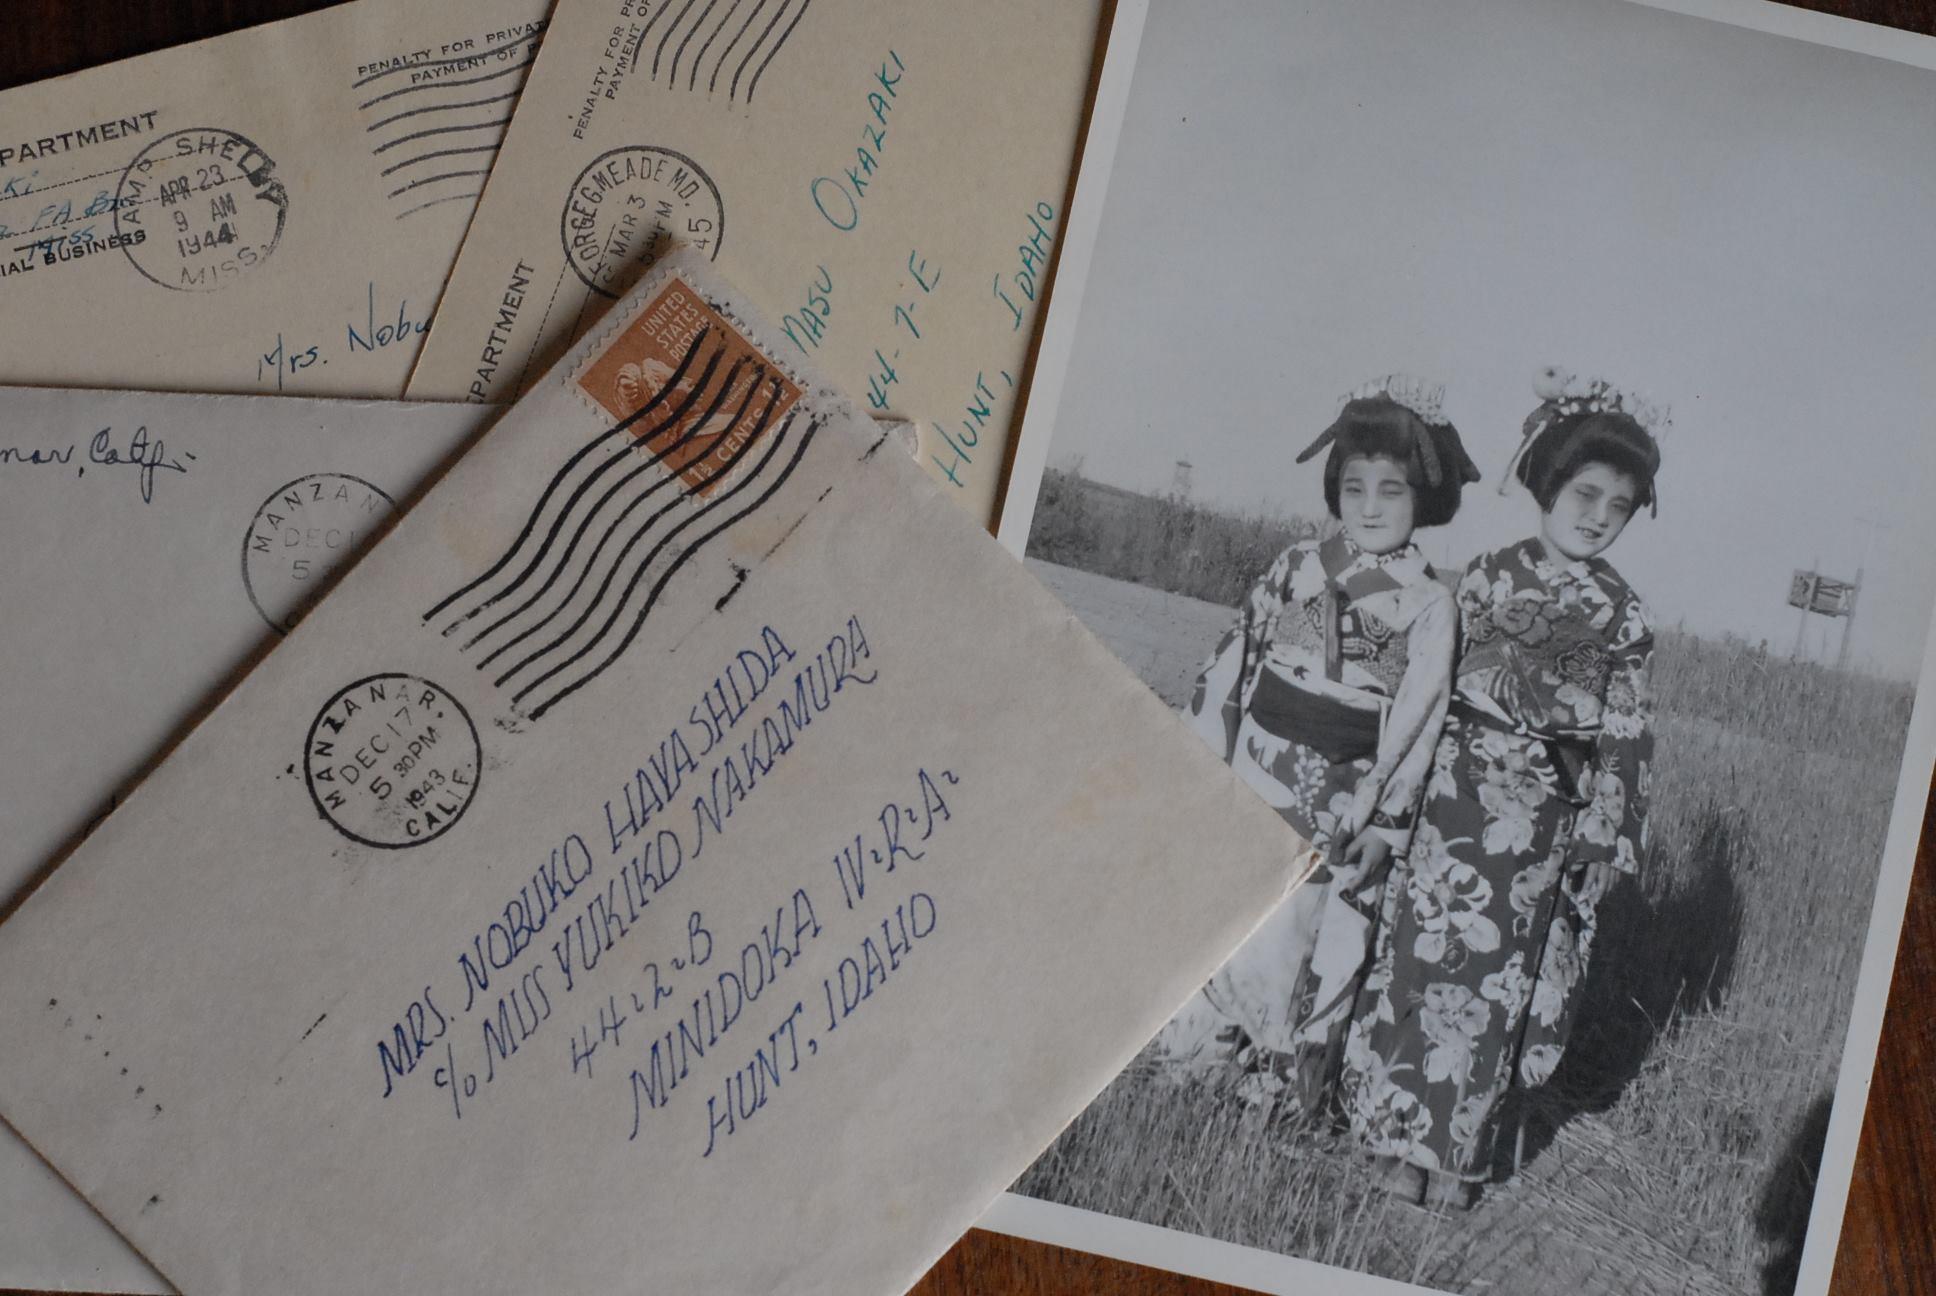 Minidoka Ghost Stories Cover Photo. Photo courtesy Minidoka Ghost Stories.